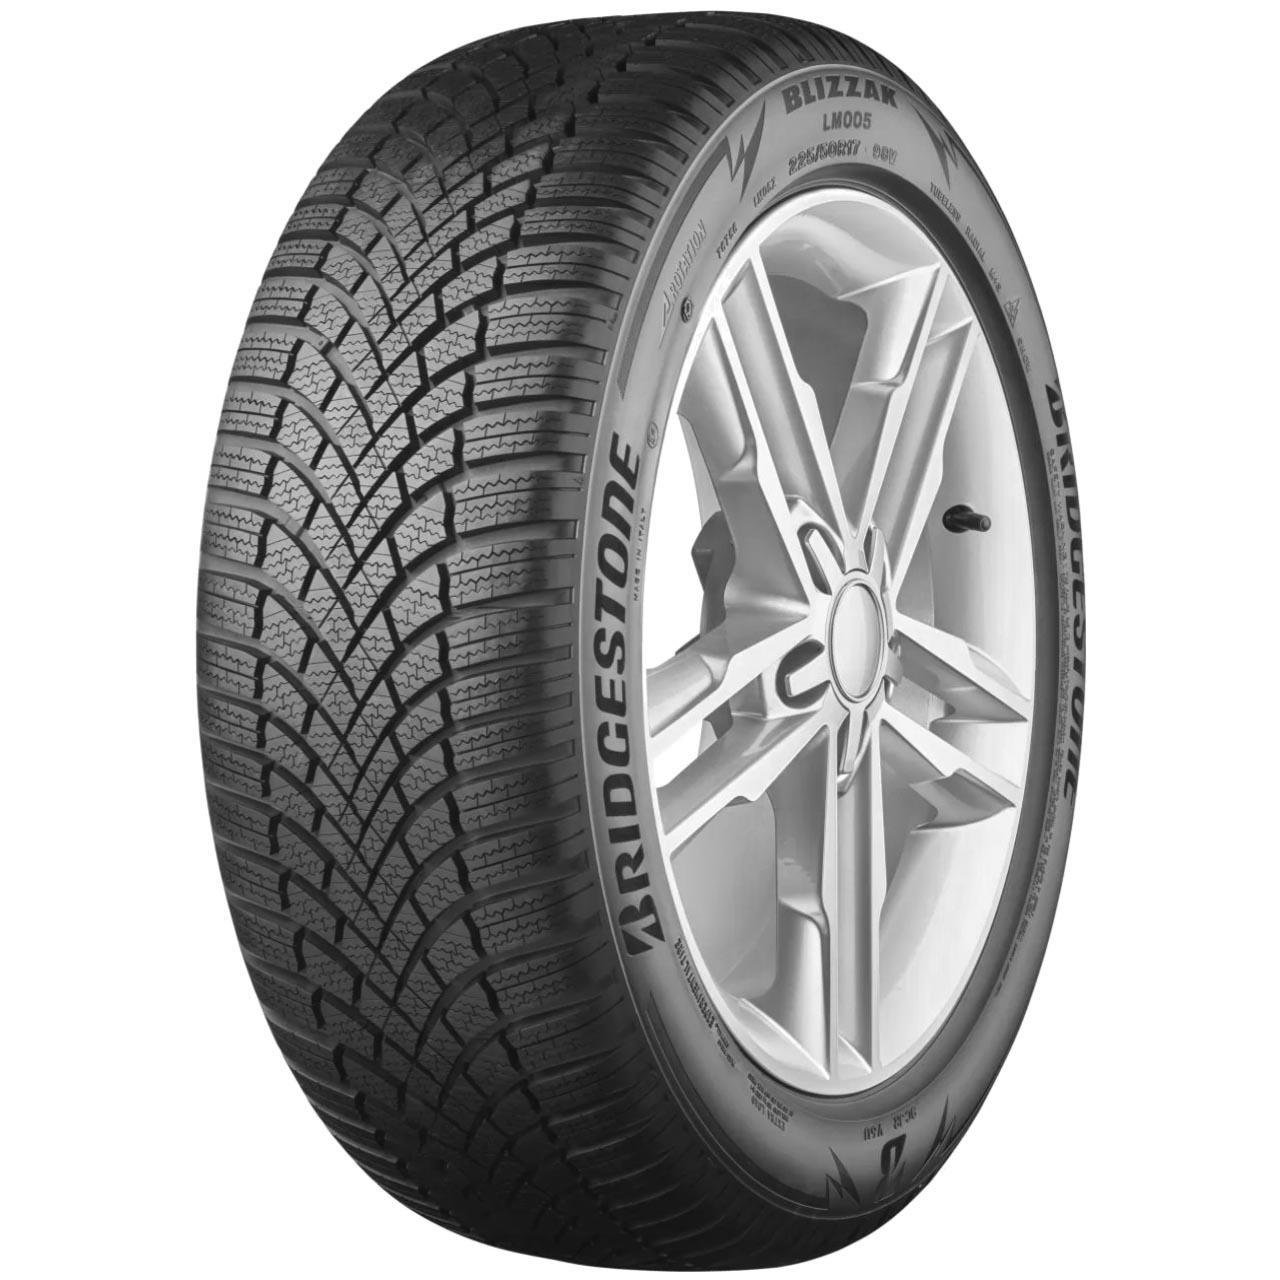 Bridgestone Blizzak LM005 235/45R18 98V XL MFS